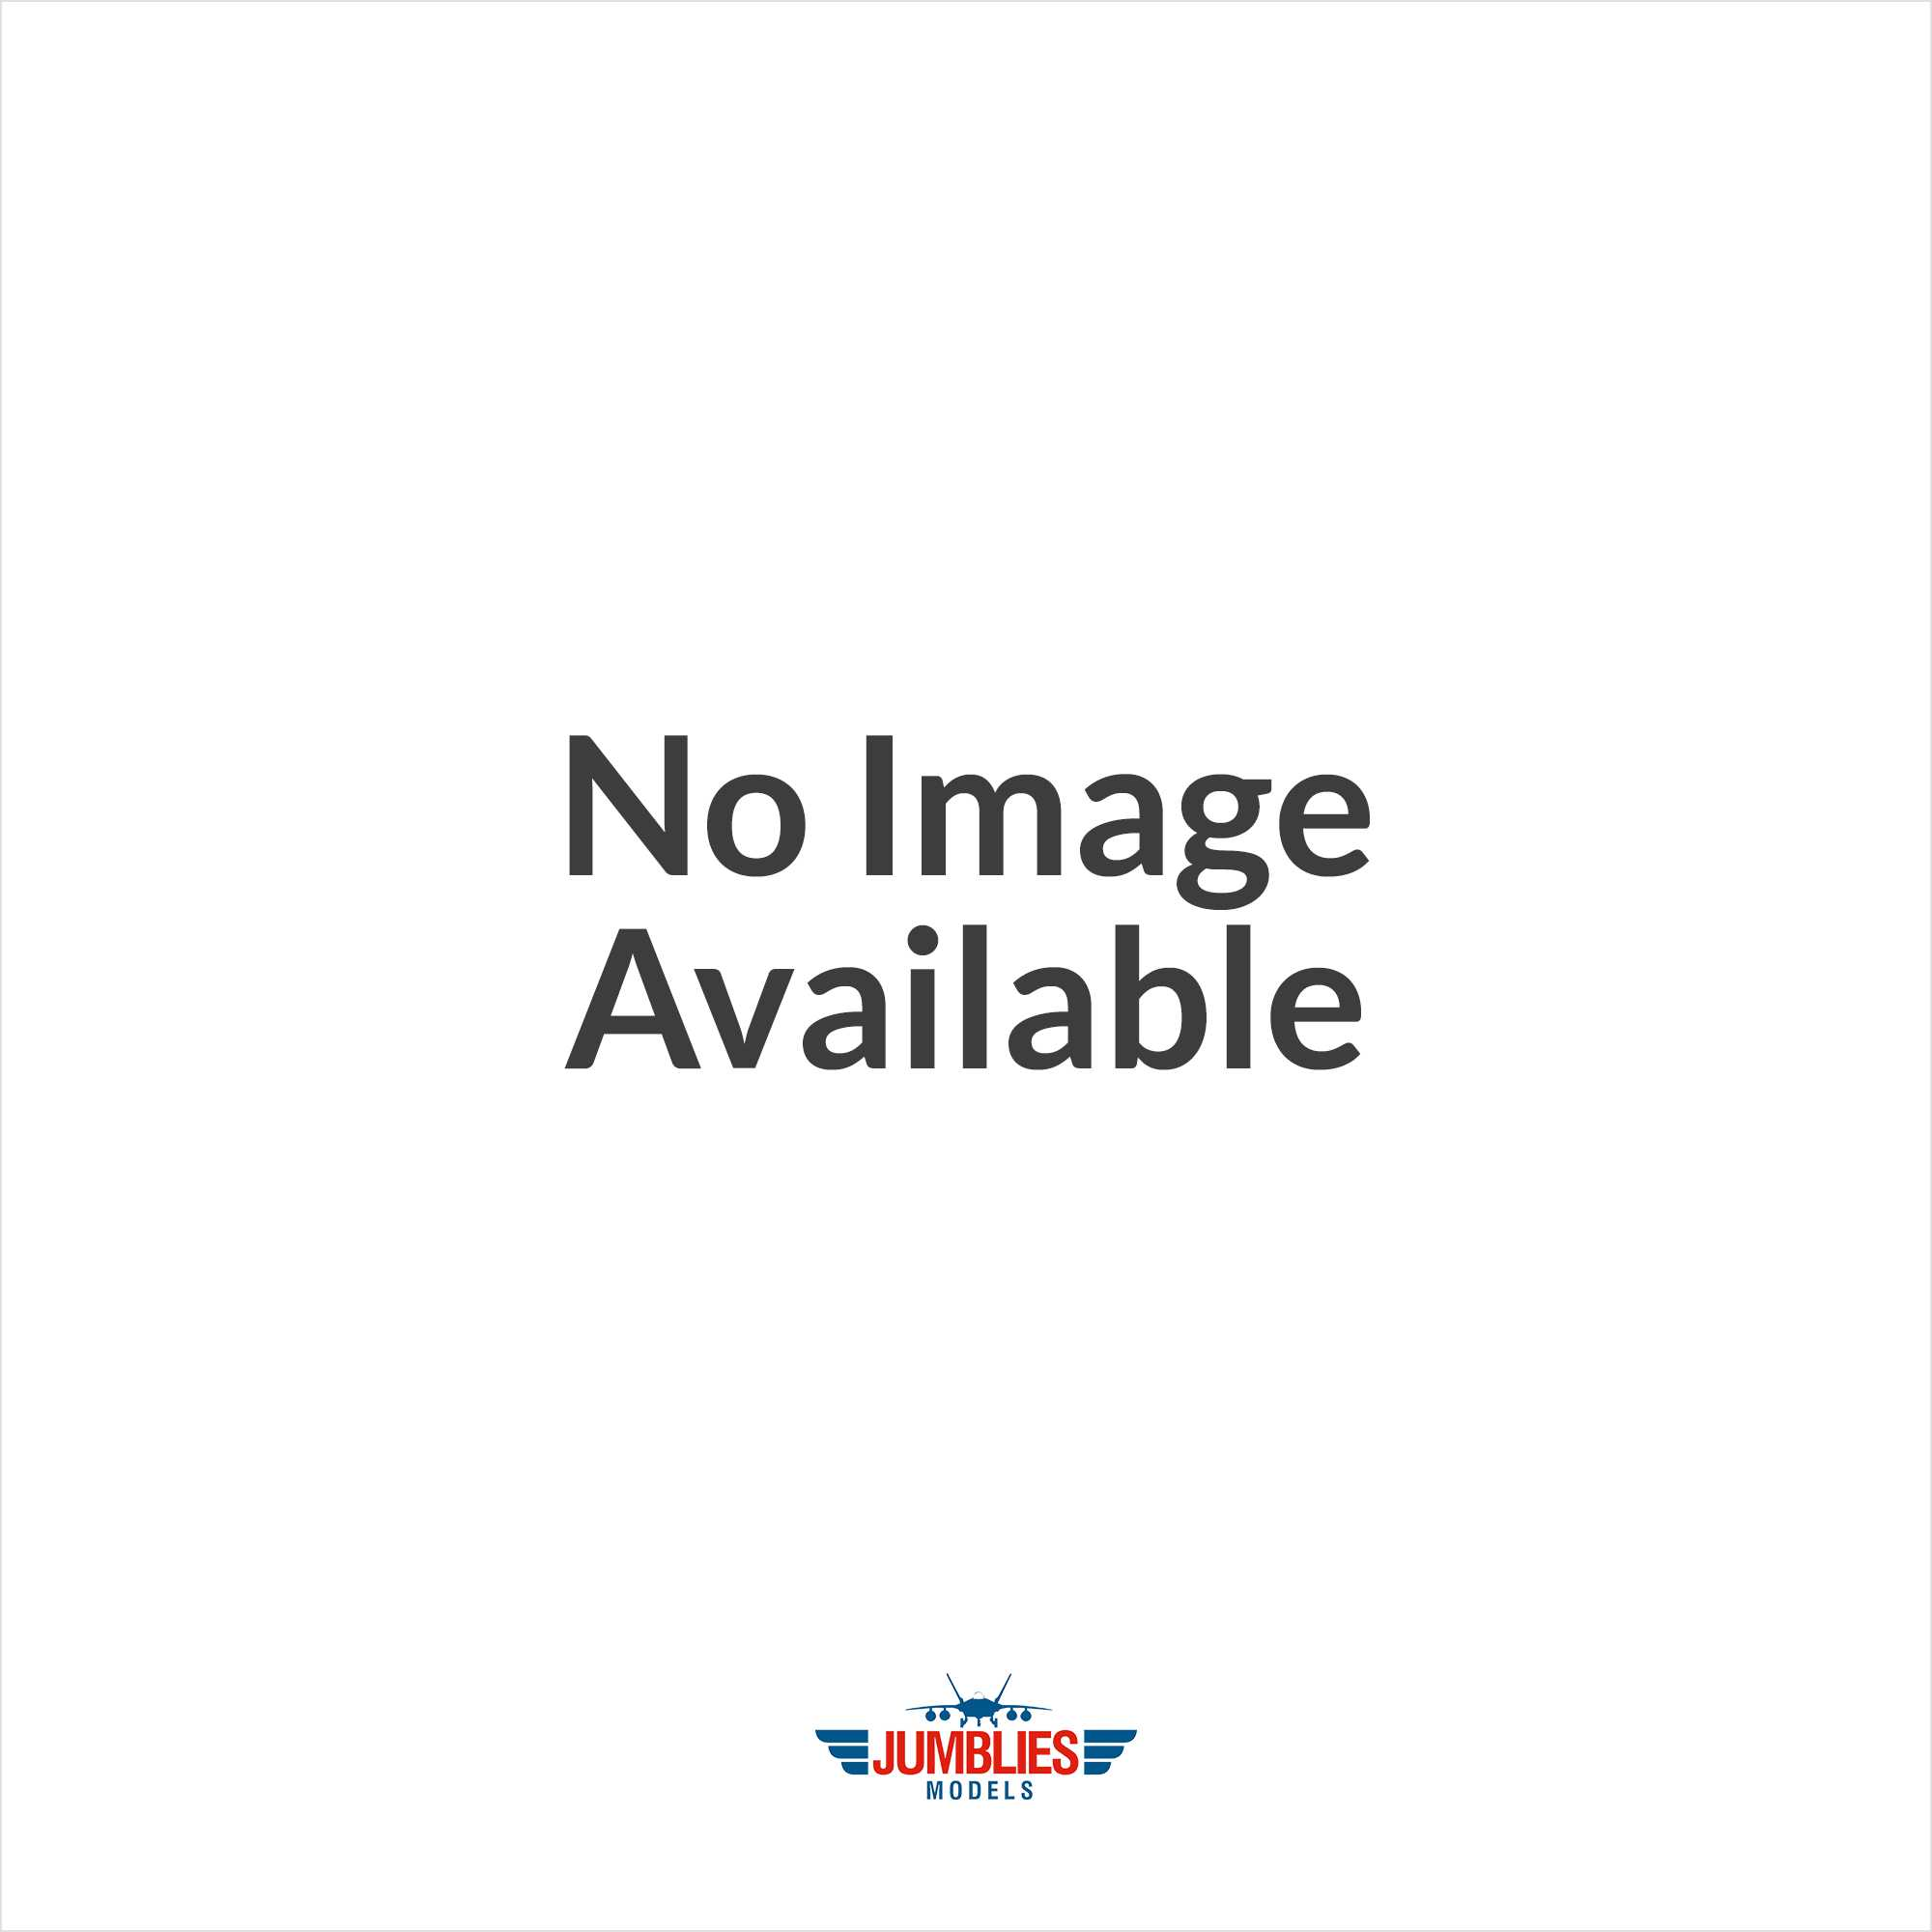 Moebius Models The Munsters Herman Munster Figure - 1:9 Scale Figure Kit